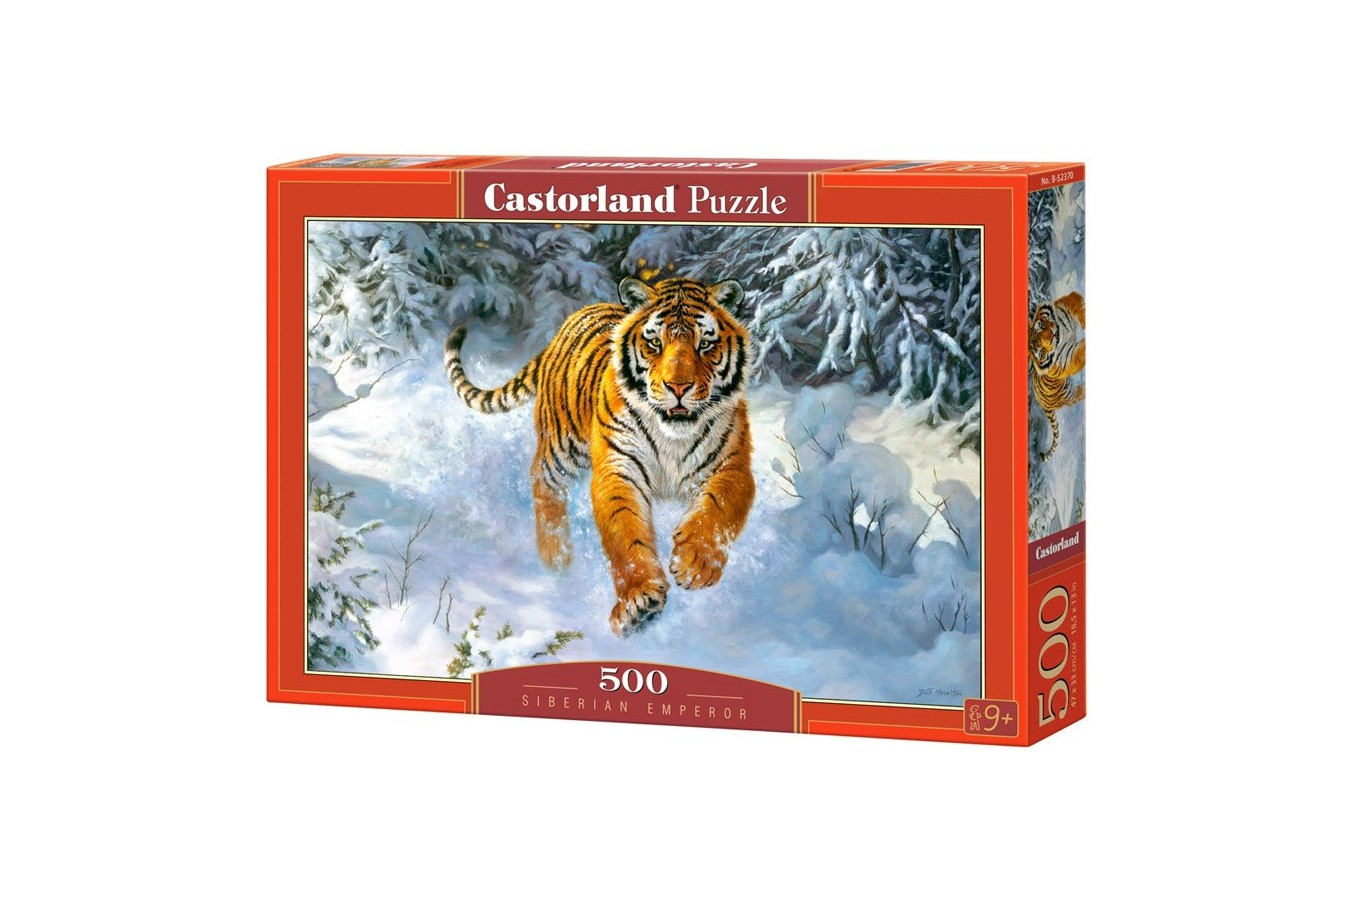 Puzzle Castorland - Siberian Emperor, 500 piese